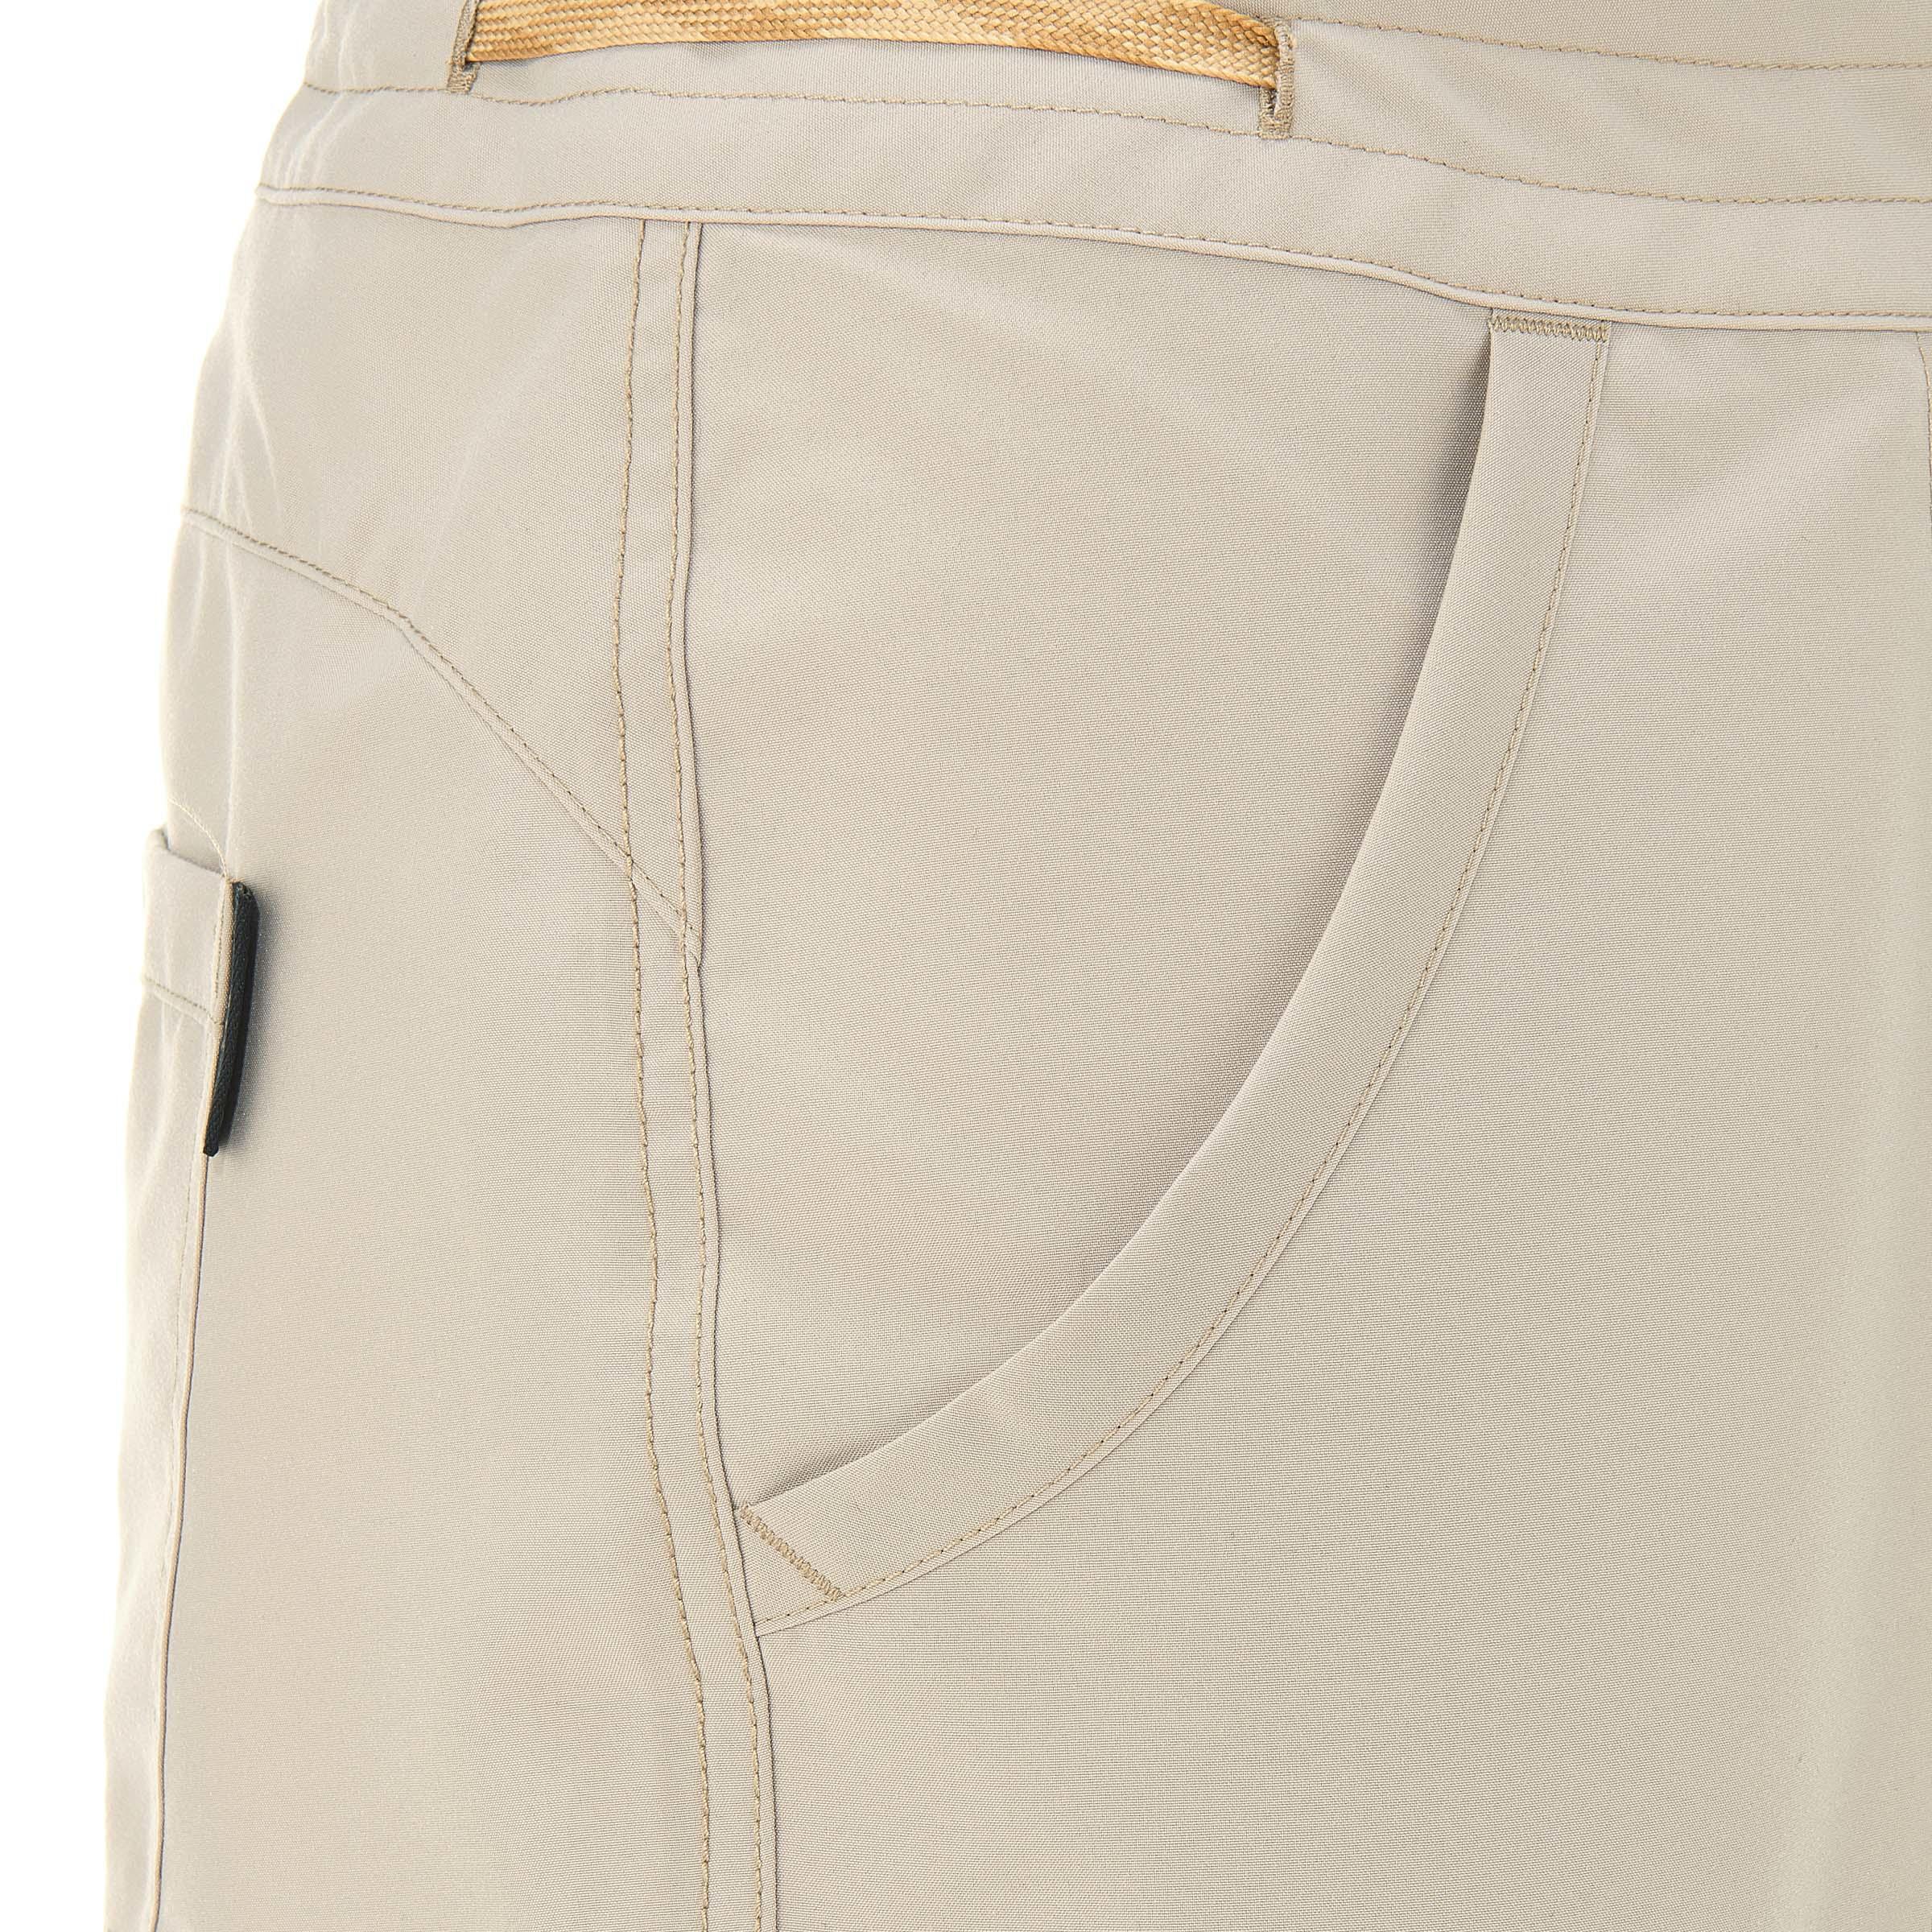 Women's Hiking Trousers NH100 - Beige